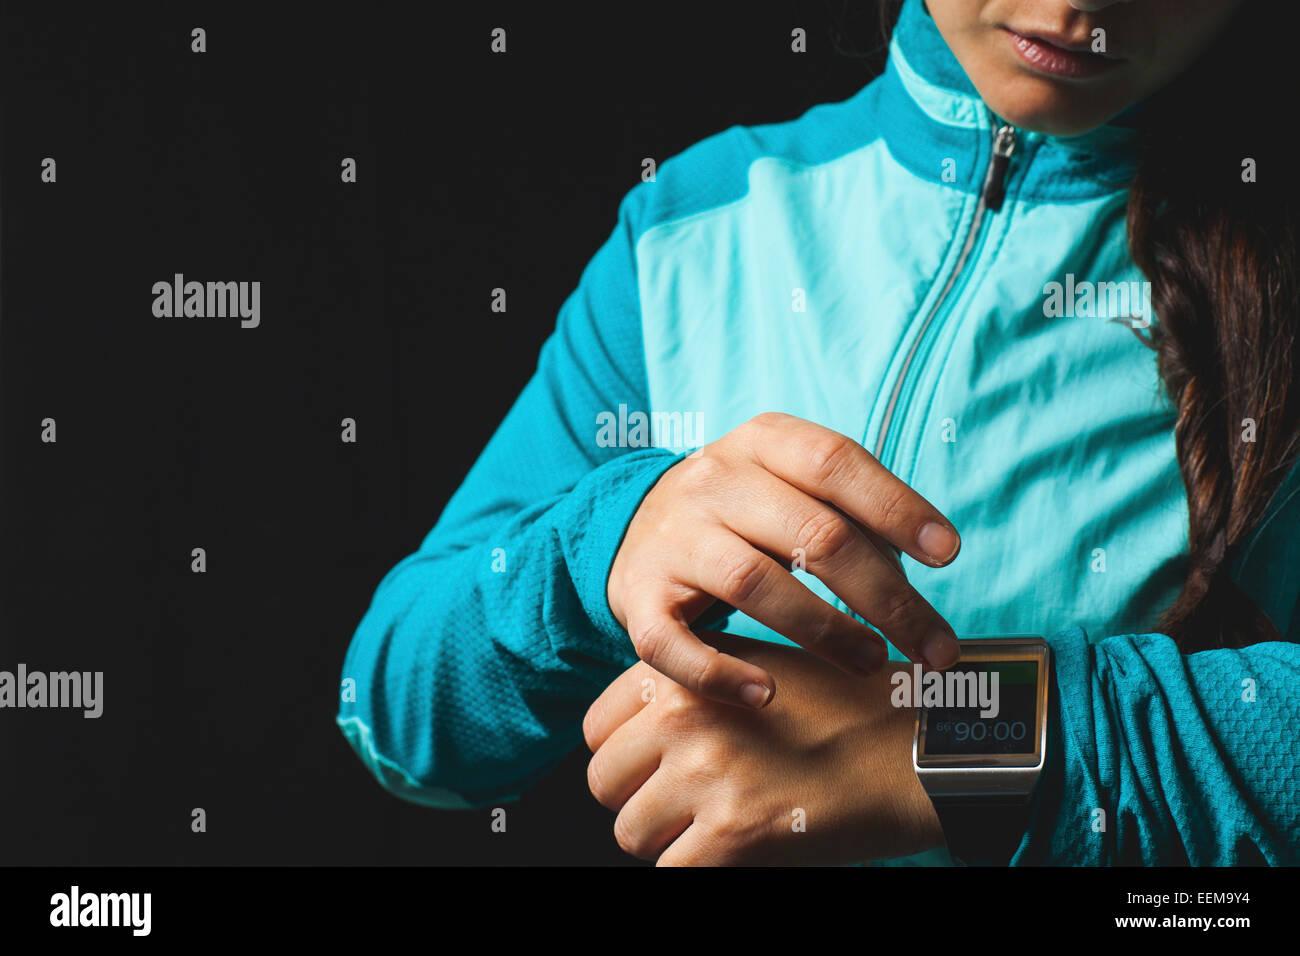 Mujer vistiendo reloj inteligente dispositivo sobre fondo negro Imagen De Stock